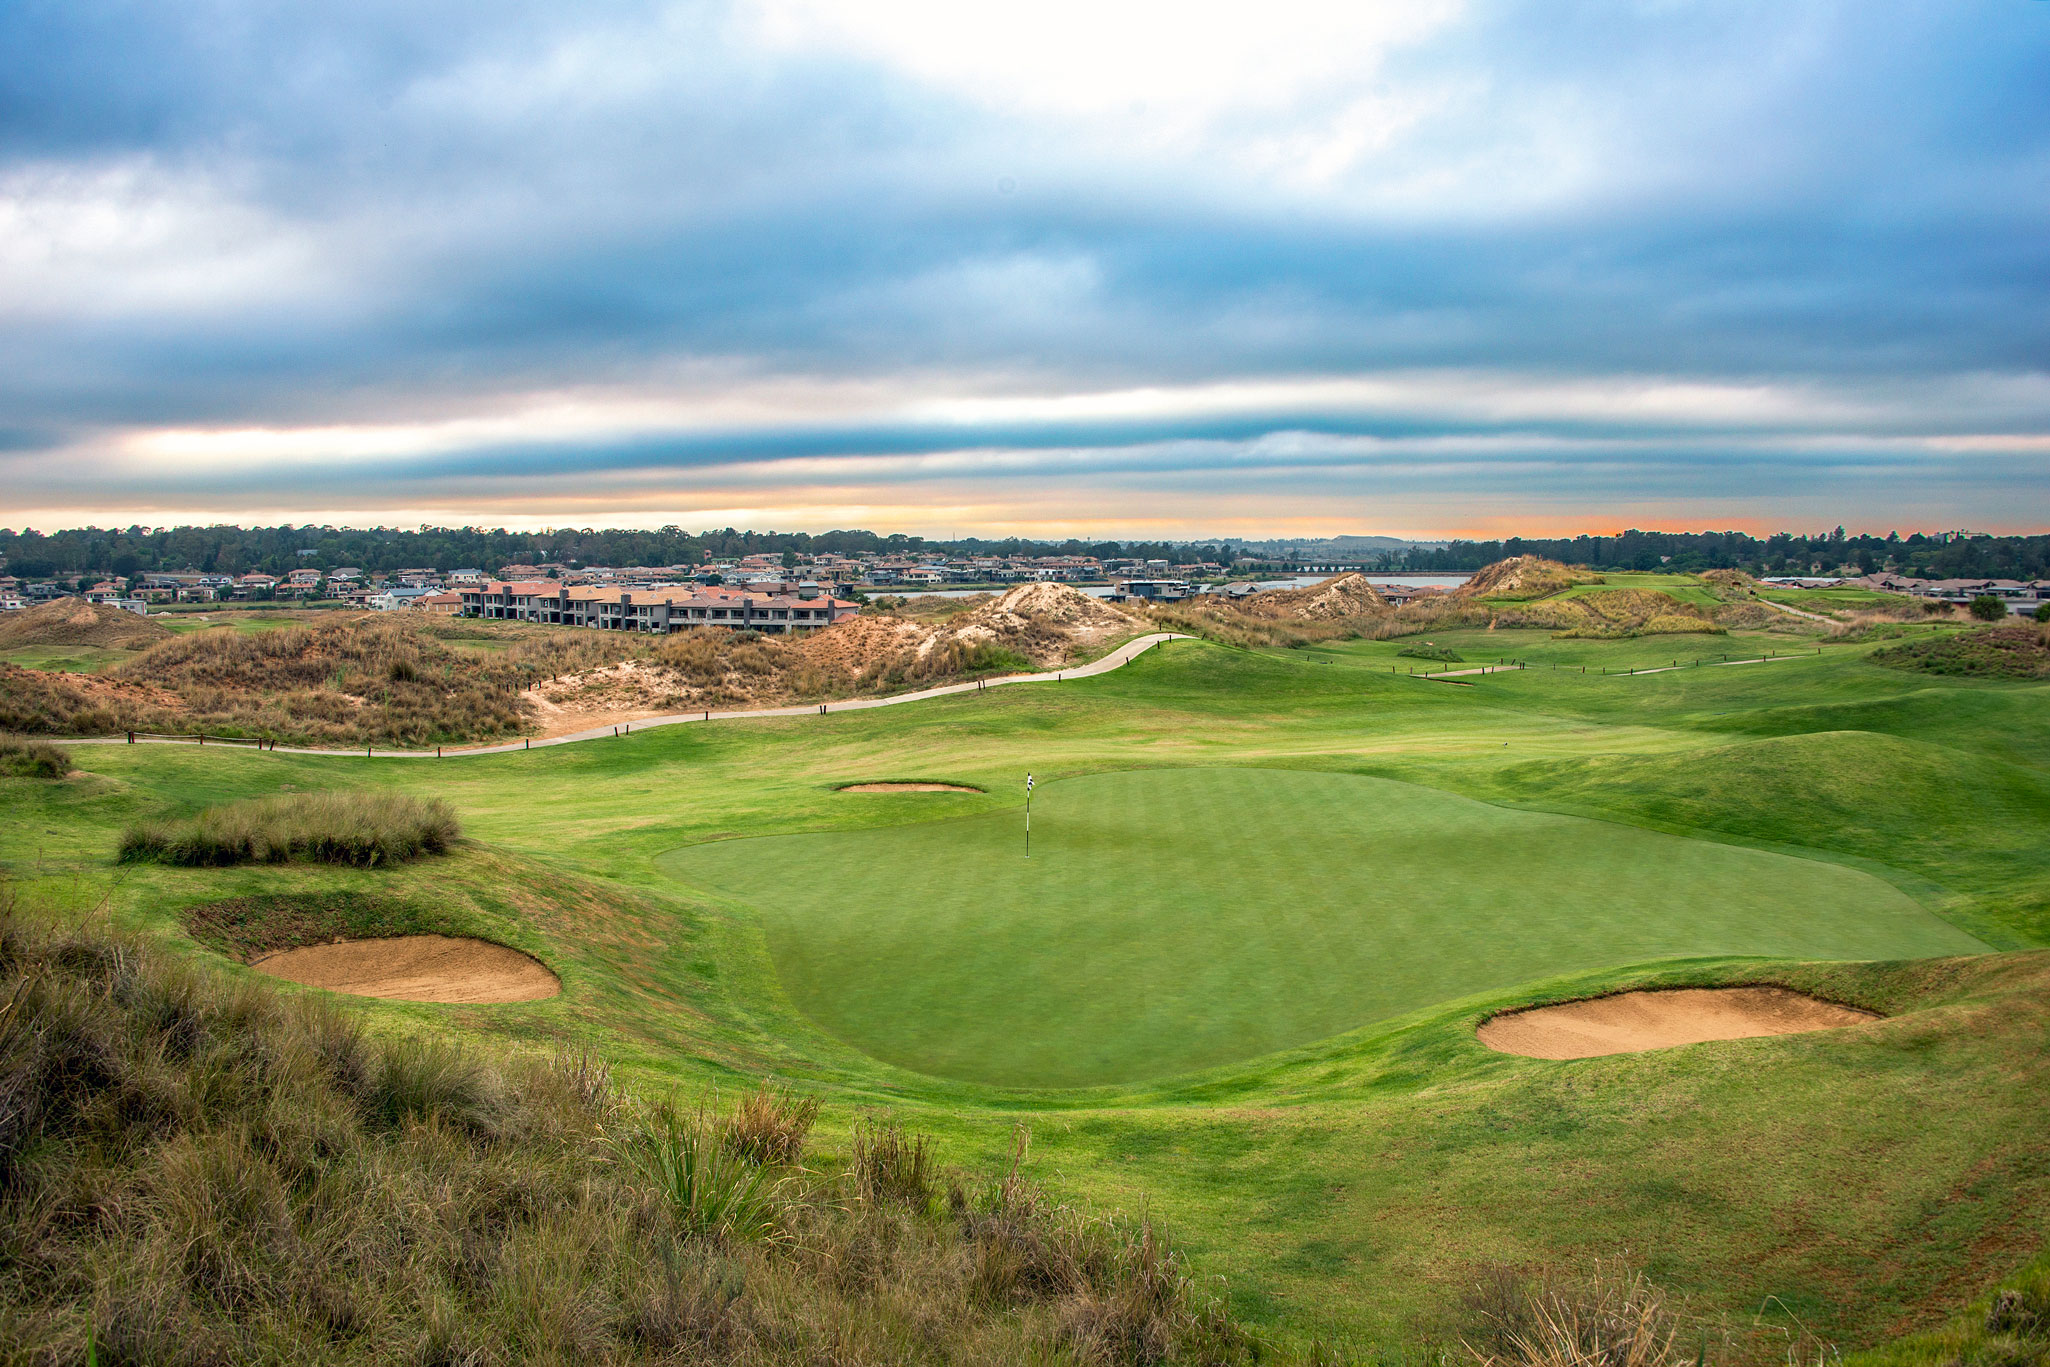 Ebotse-Golf-and-Country-Estate-Hole-3